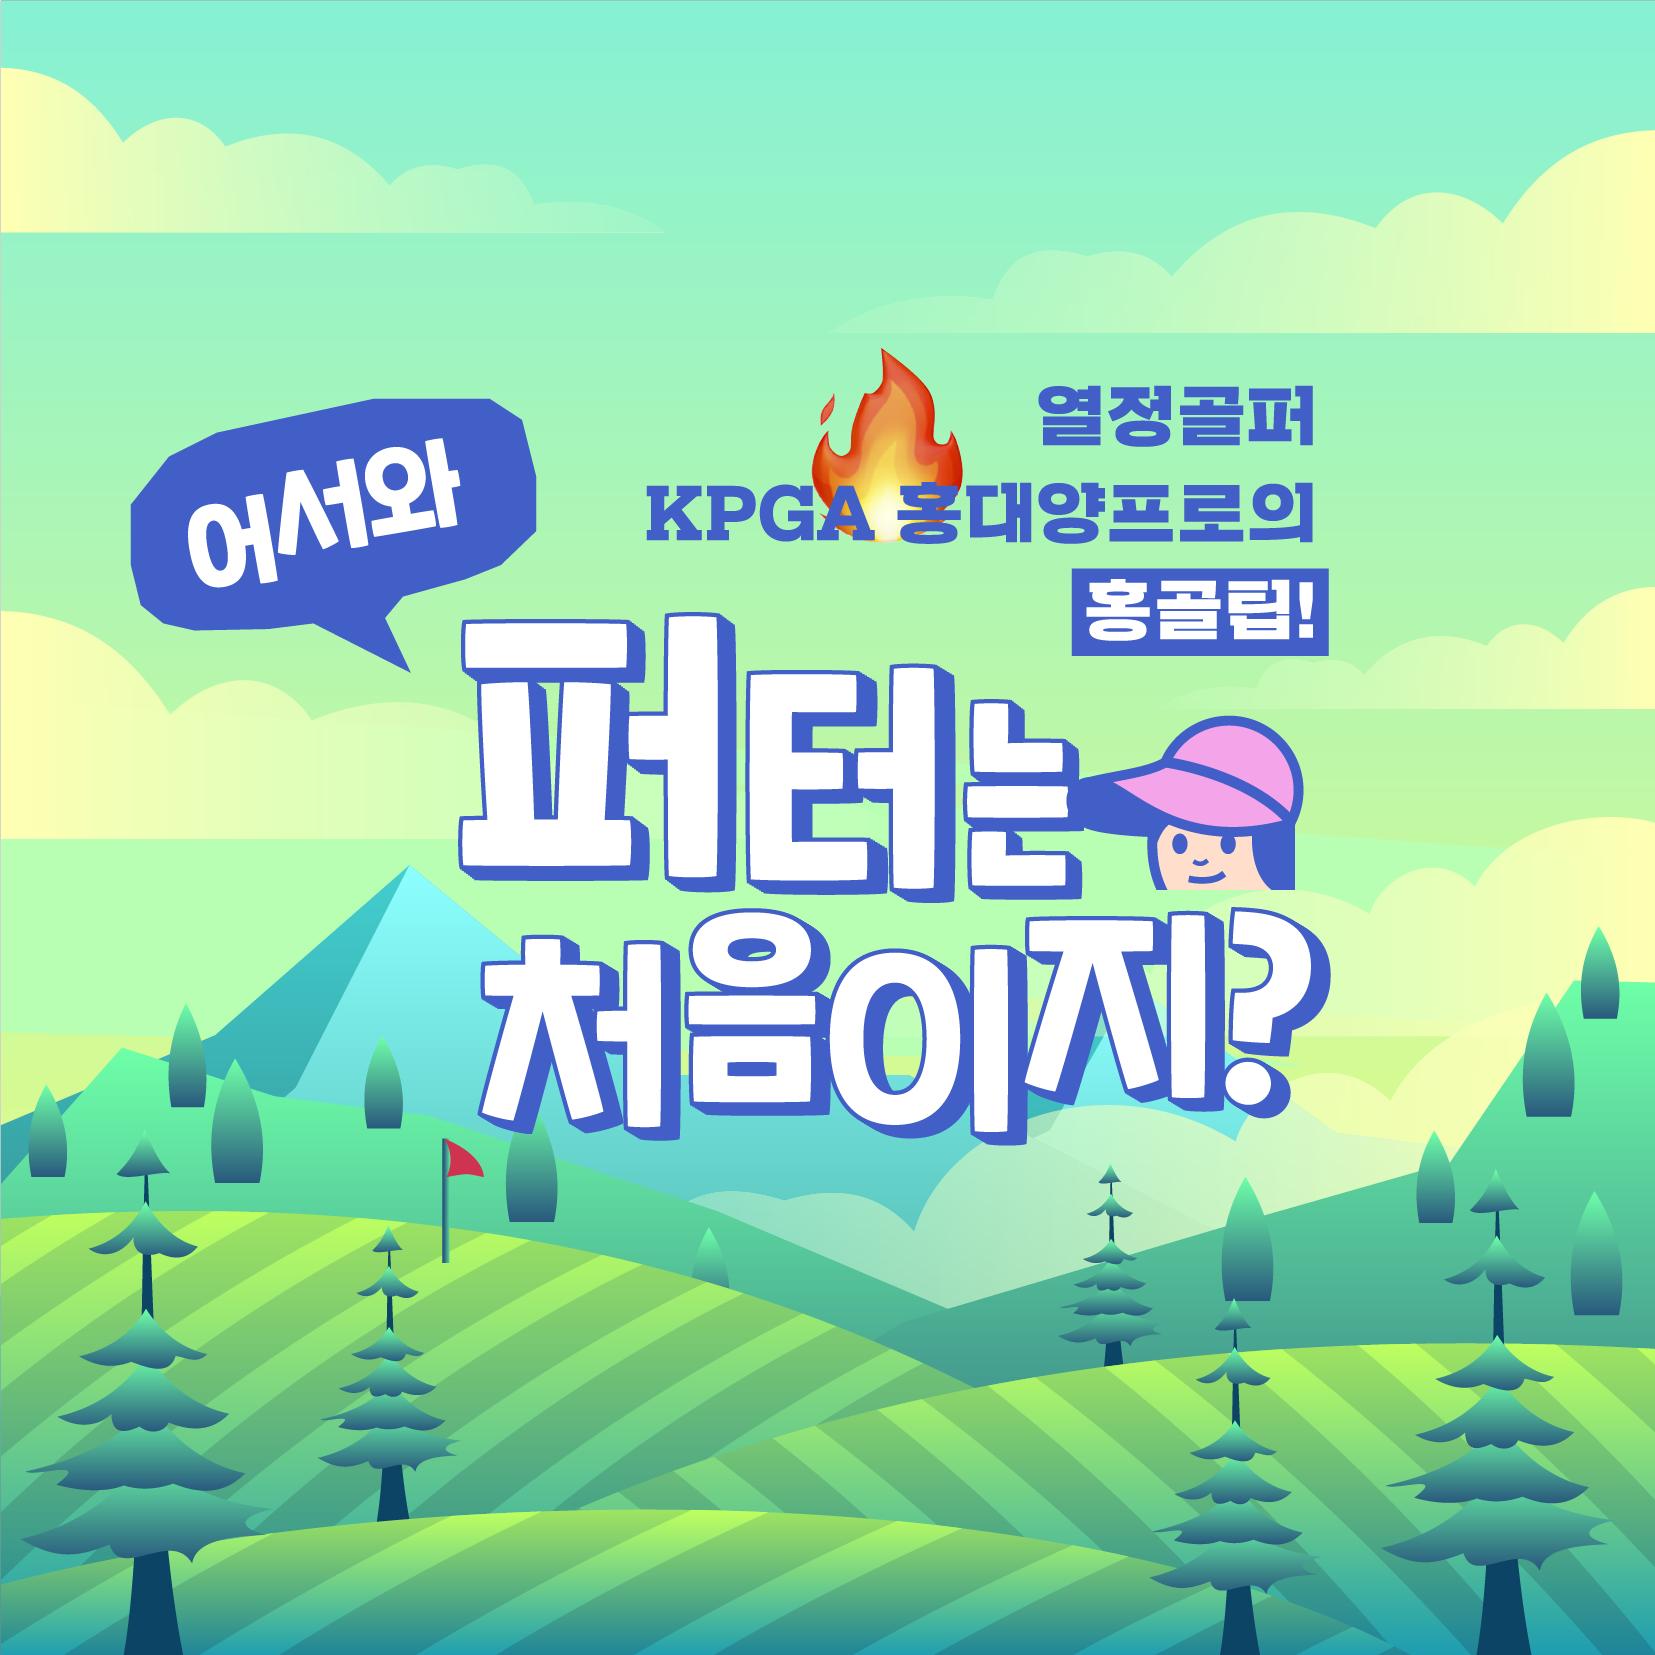 kpga-홍대양-프로-x-김캐디-퍼팅-잘하는-법과-올바른-퍼팅-자세-홍골팁-2탄